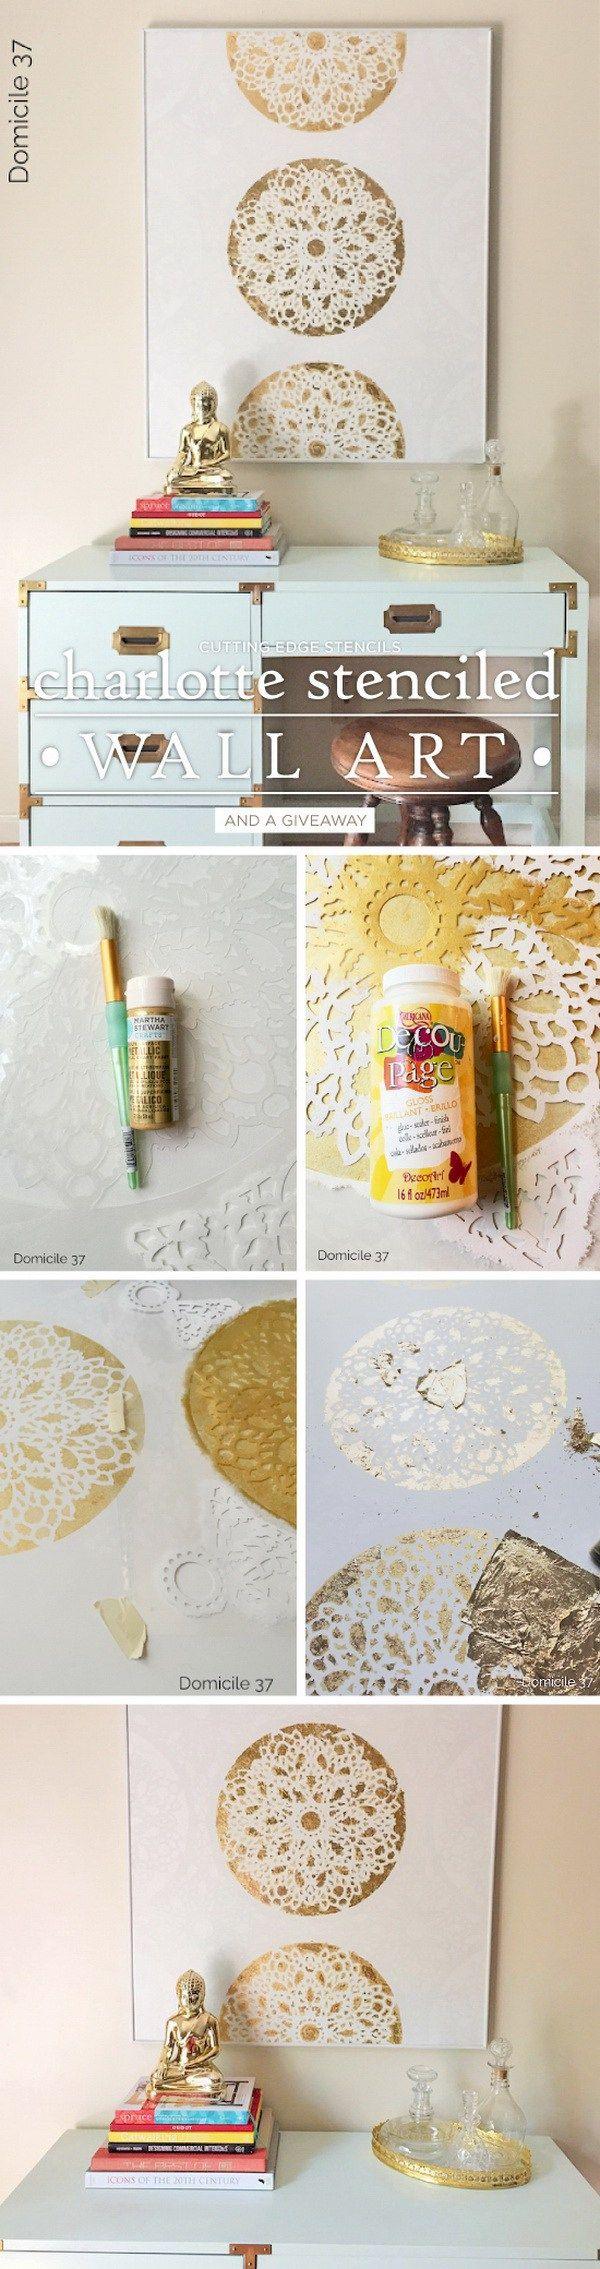 25 stunning diy wall art ideas tutorials gold walls 25 stunning diy wall art ideas tutorials amipublicfo Choice Image